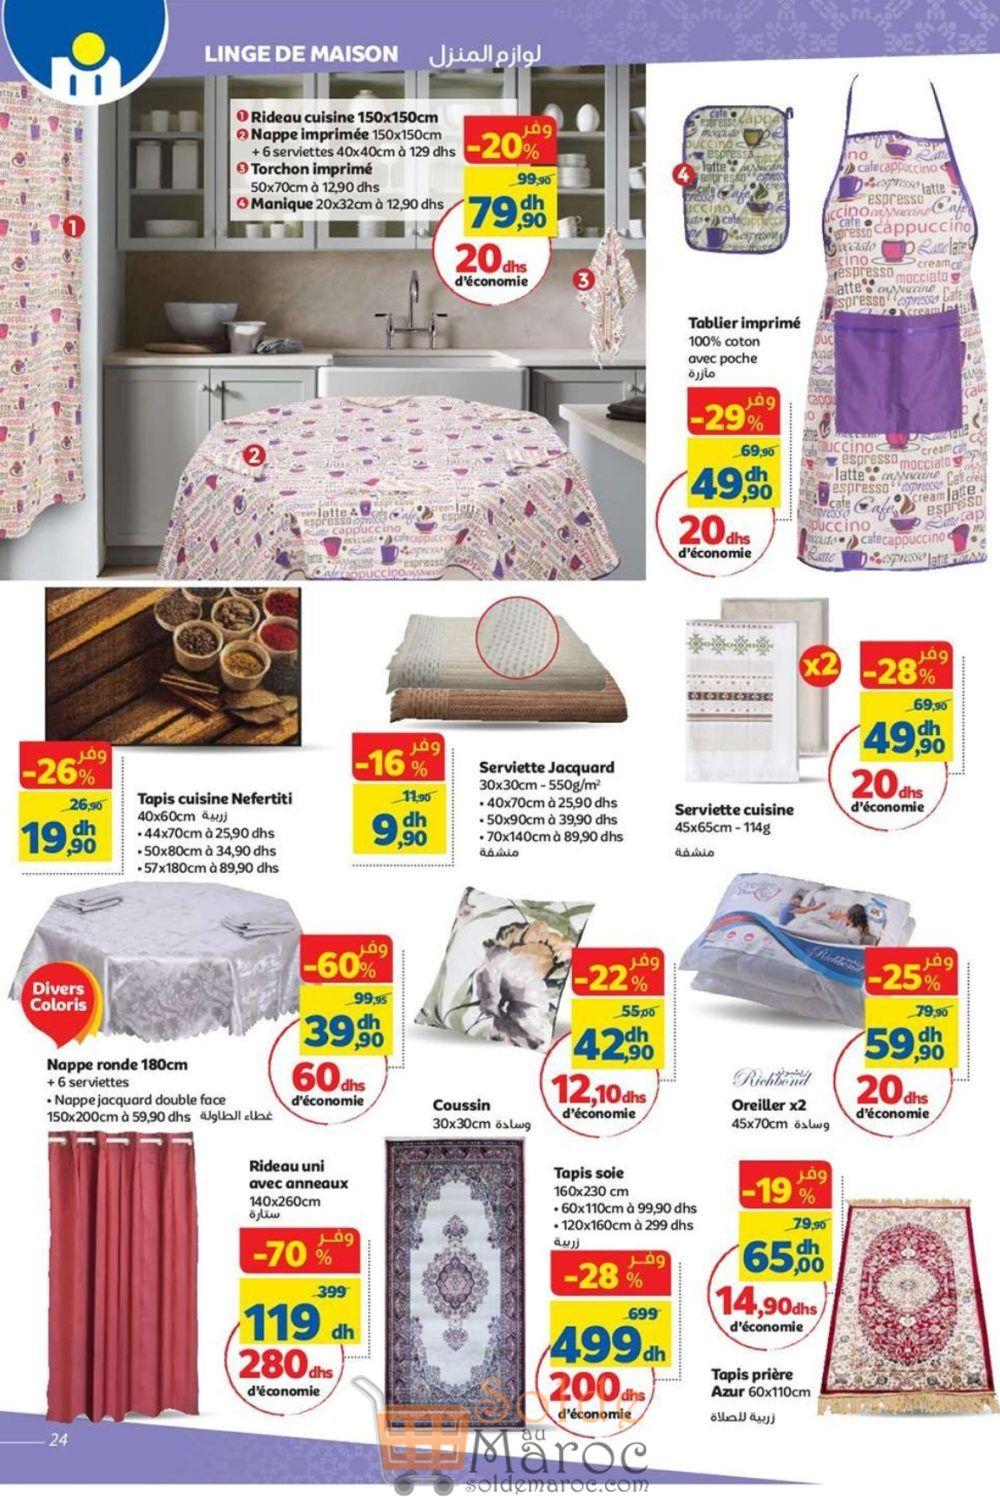 Catalogue Marjane Spéciale Ramadan du 26 Avril au 21 Mai 2018